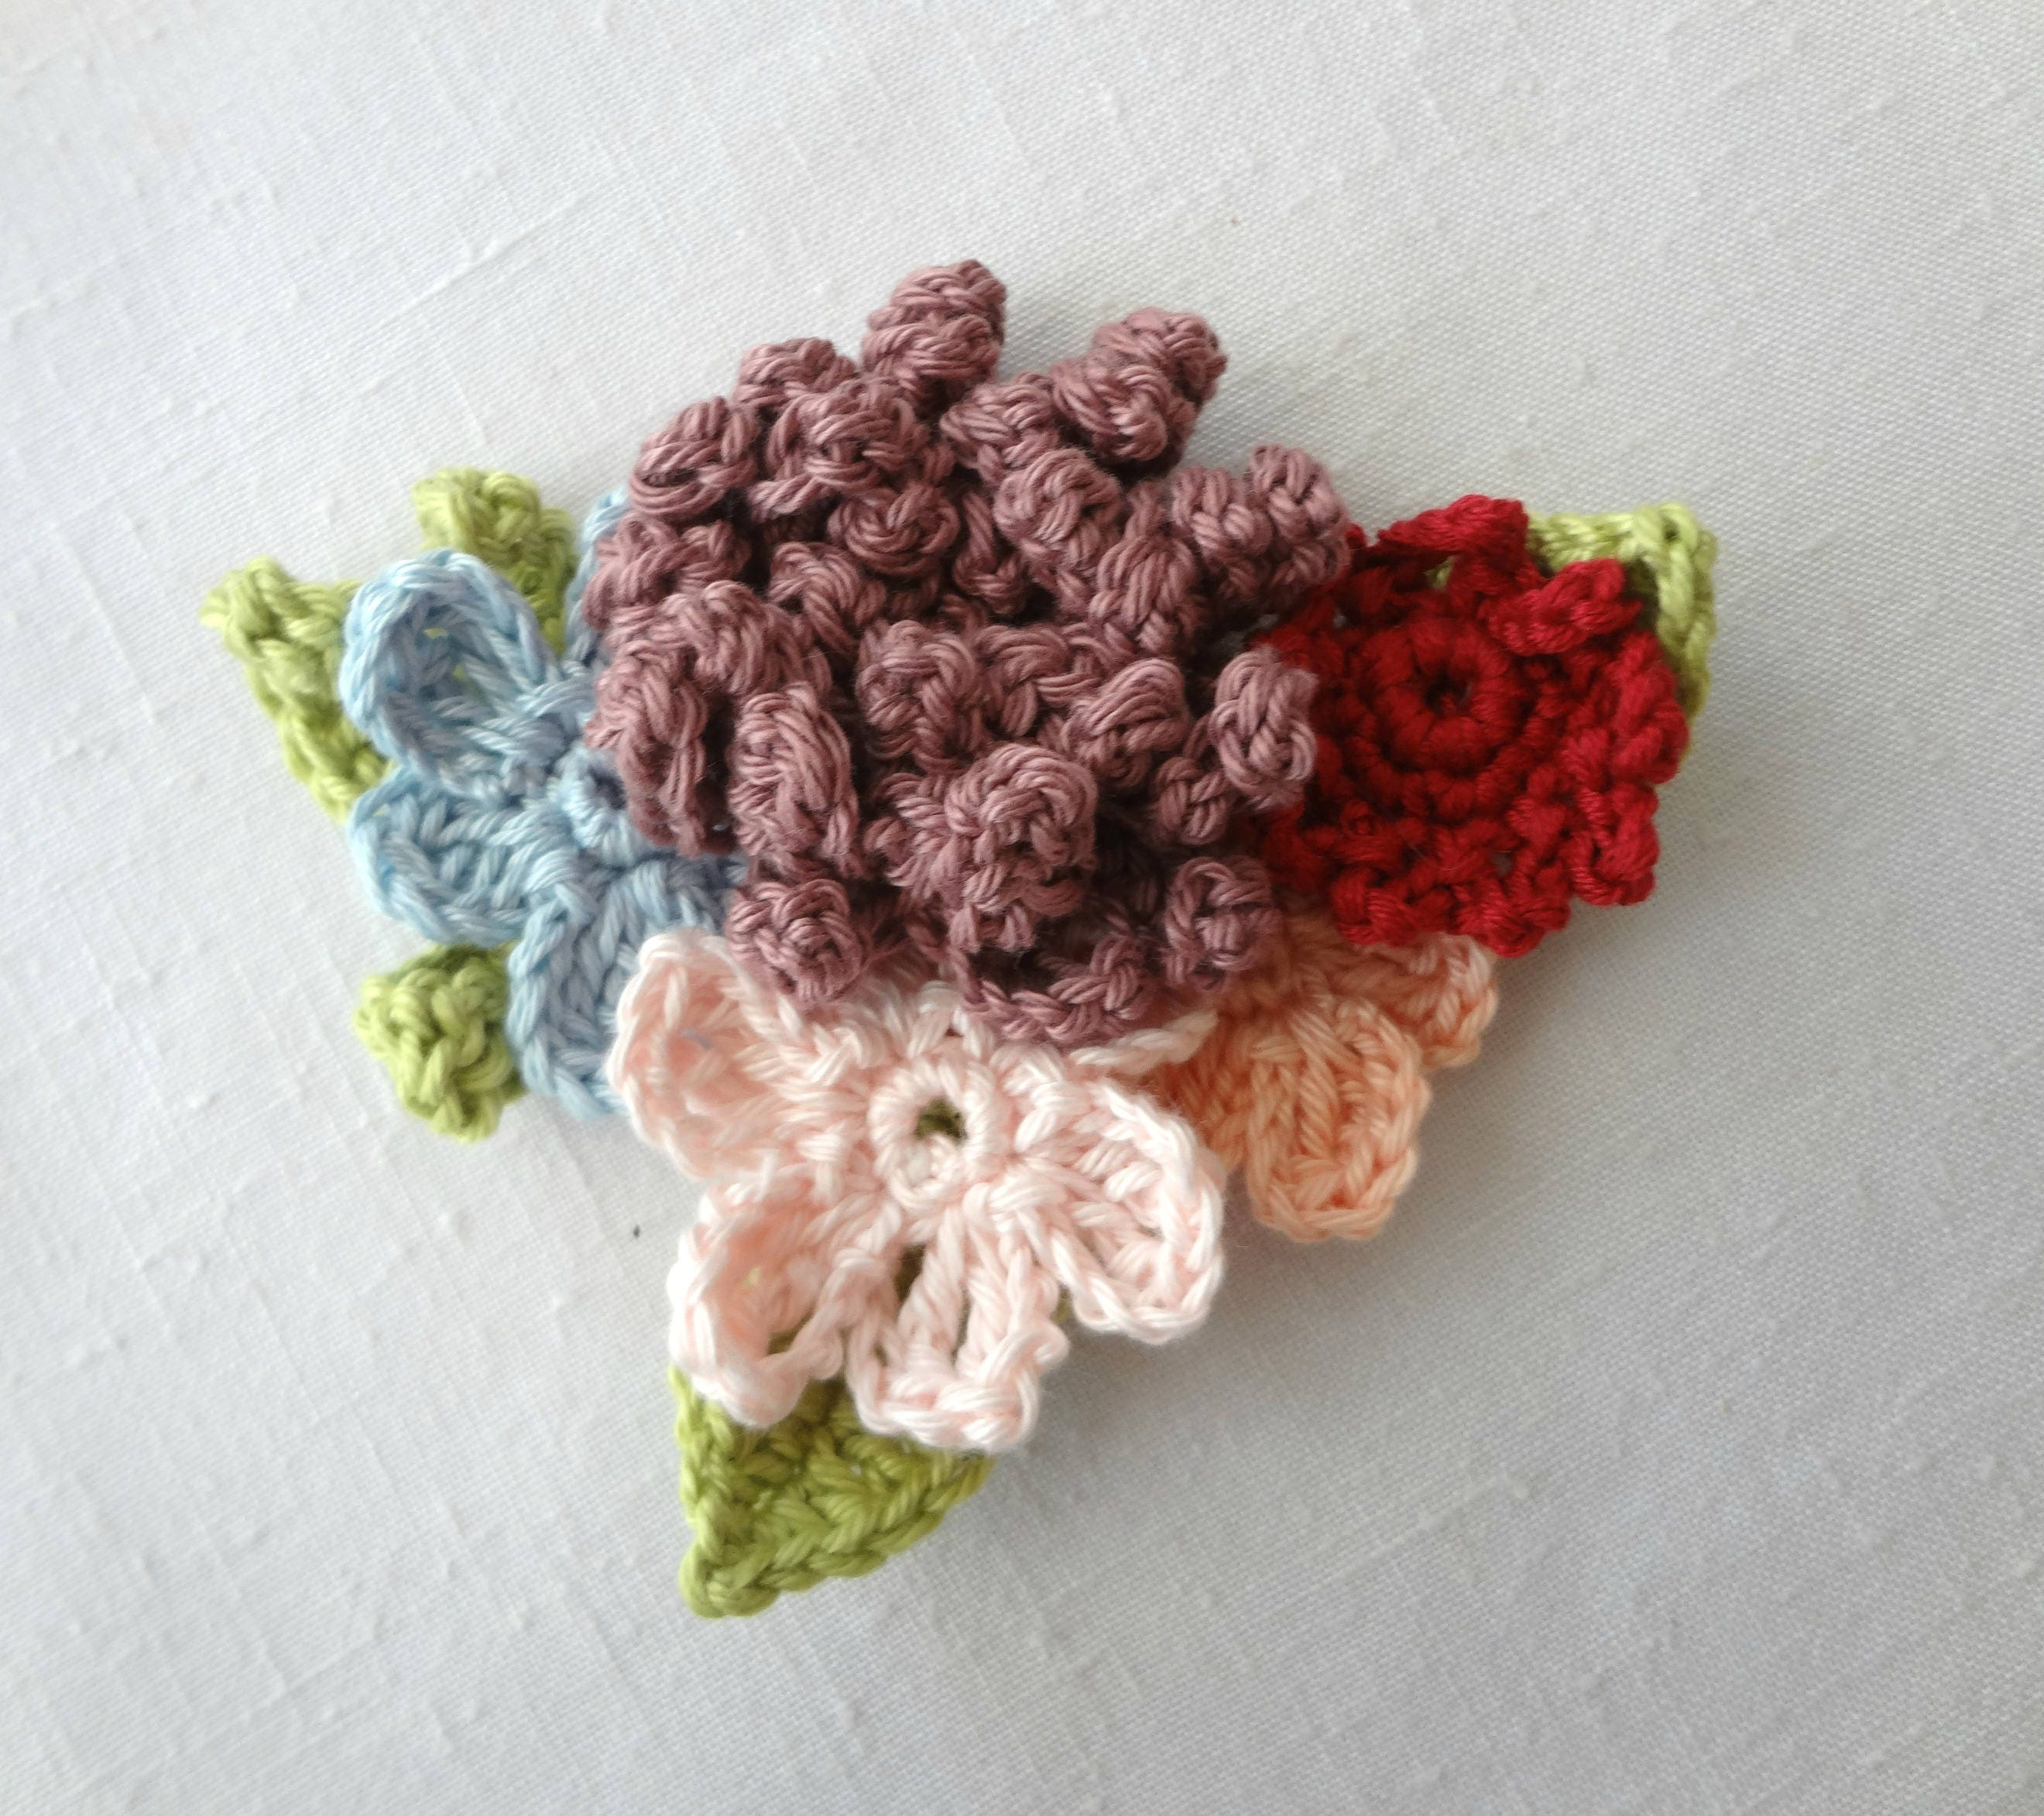 Crochet pattern romantic bohemian brooch crocheted etsy image 2 izmirmasajfo